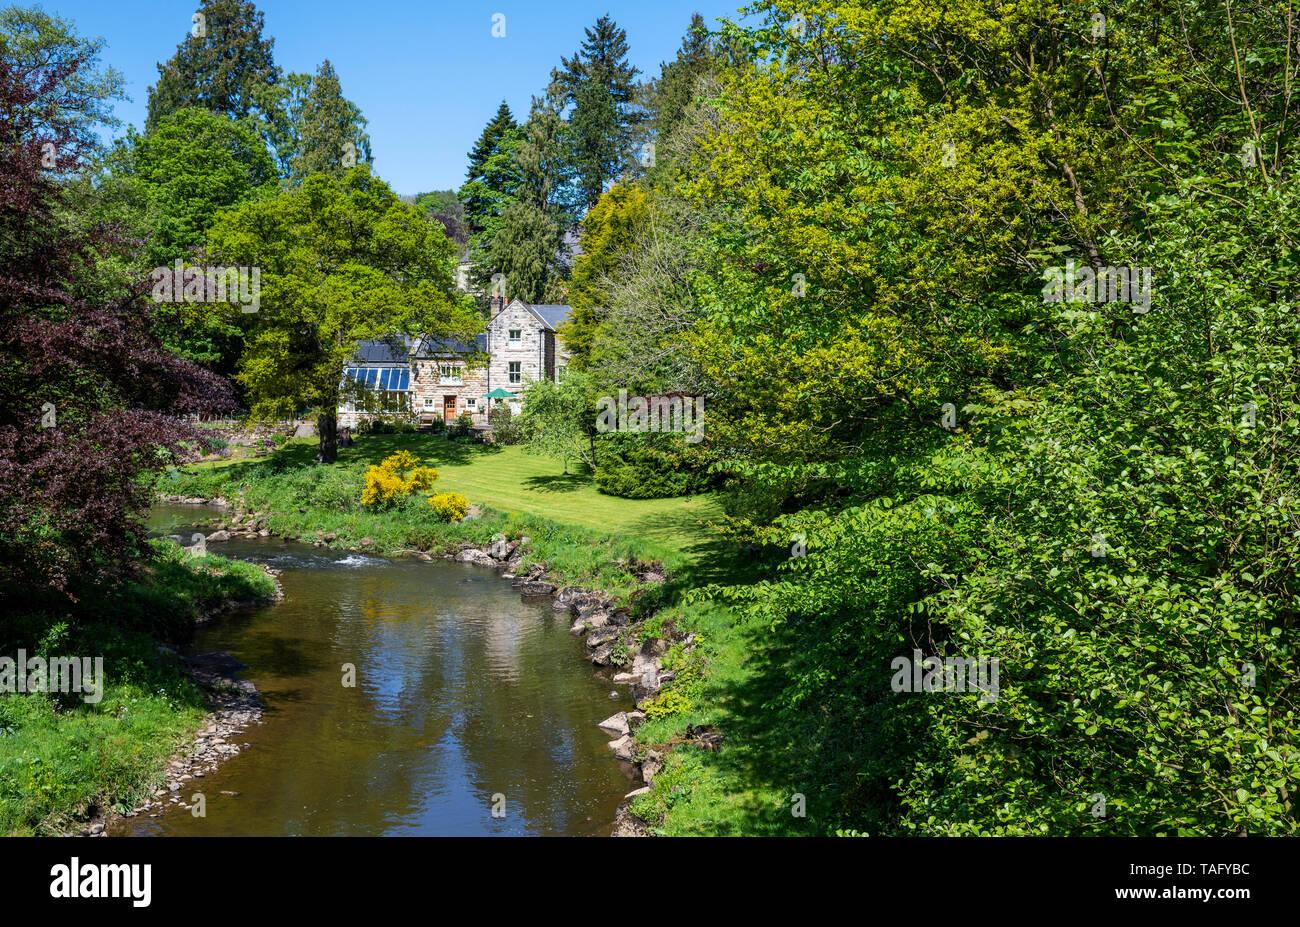 The River Esk from Egton Bridge, North York Moors, Yorkshire, UK - Stock Image